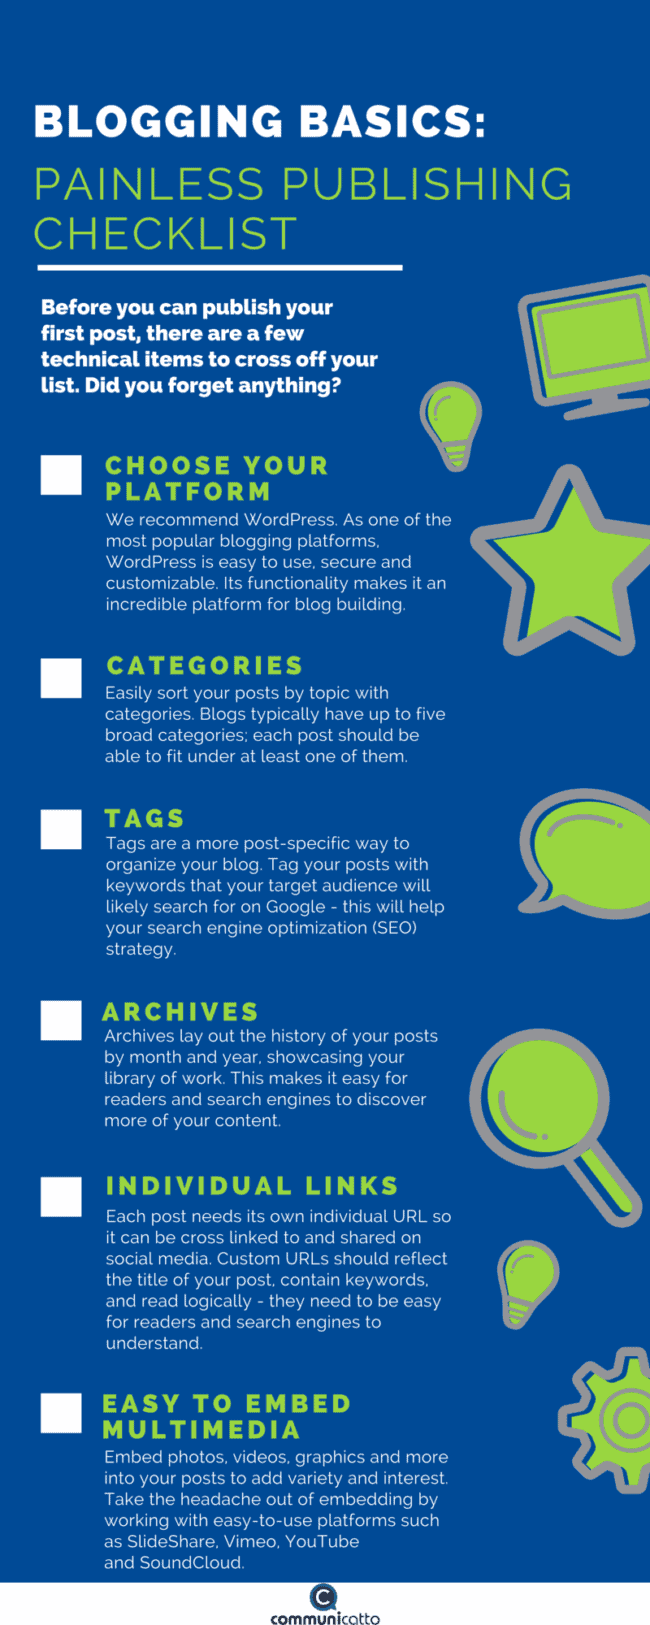 Painless blog publishing checklist